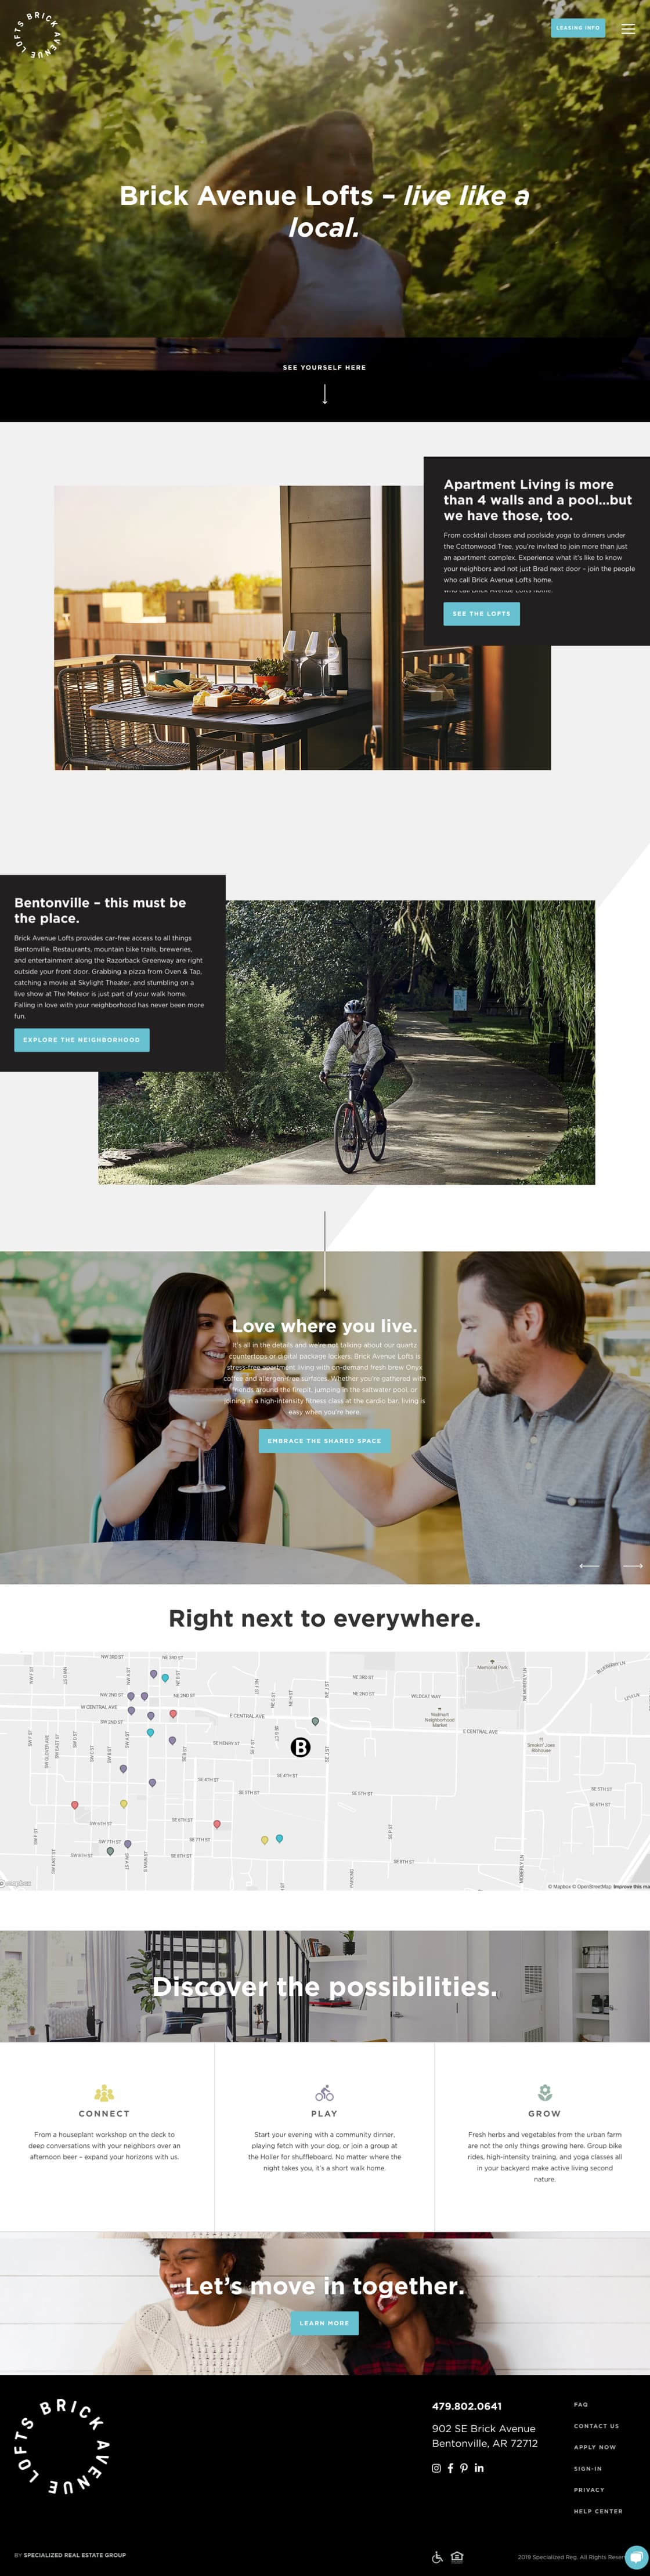 Brick Ave Lofts custom wordpress home page design